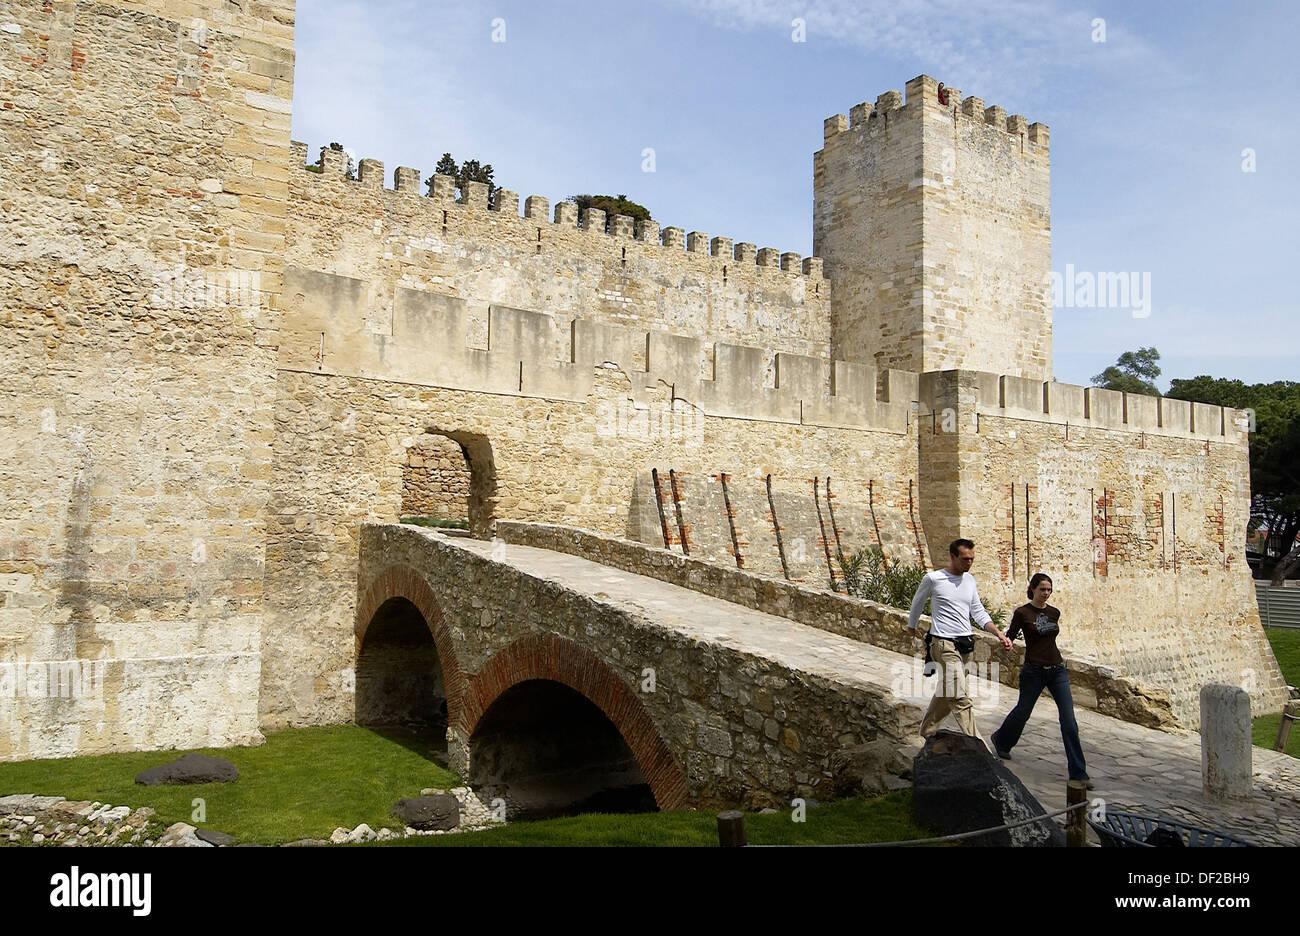 St. George´s Castle. Lisbon, Portugal - Stock Image